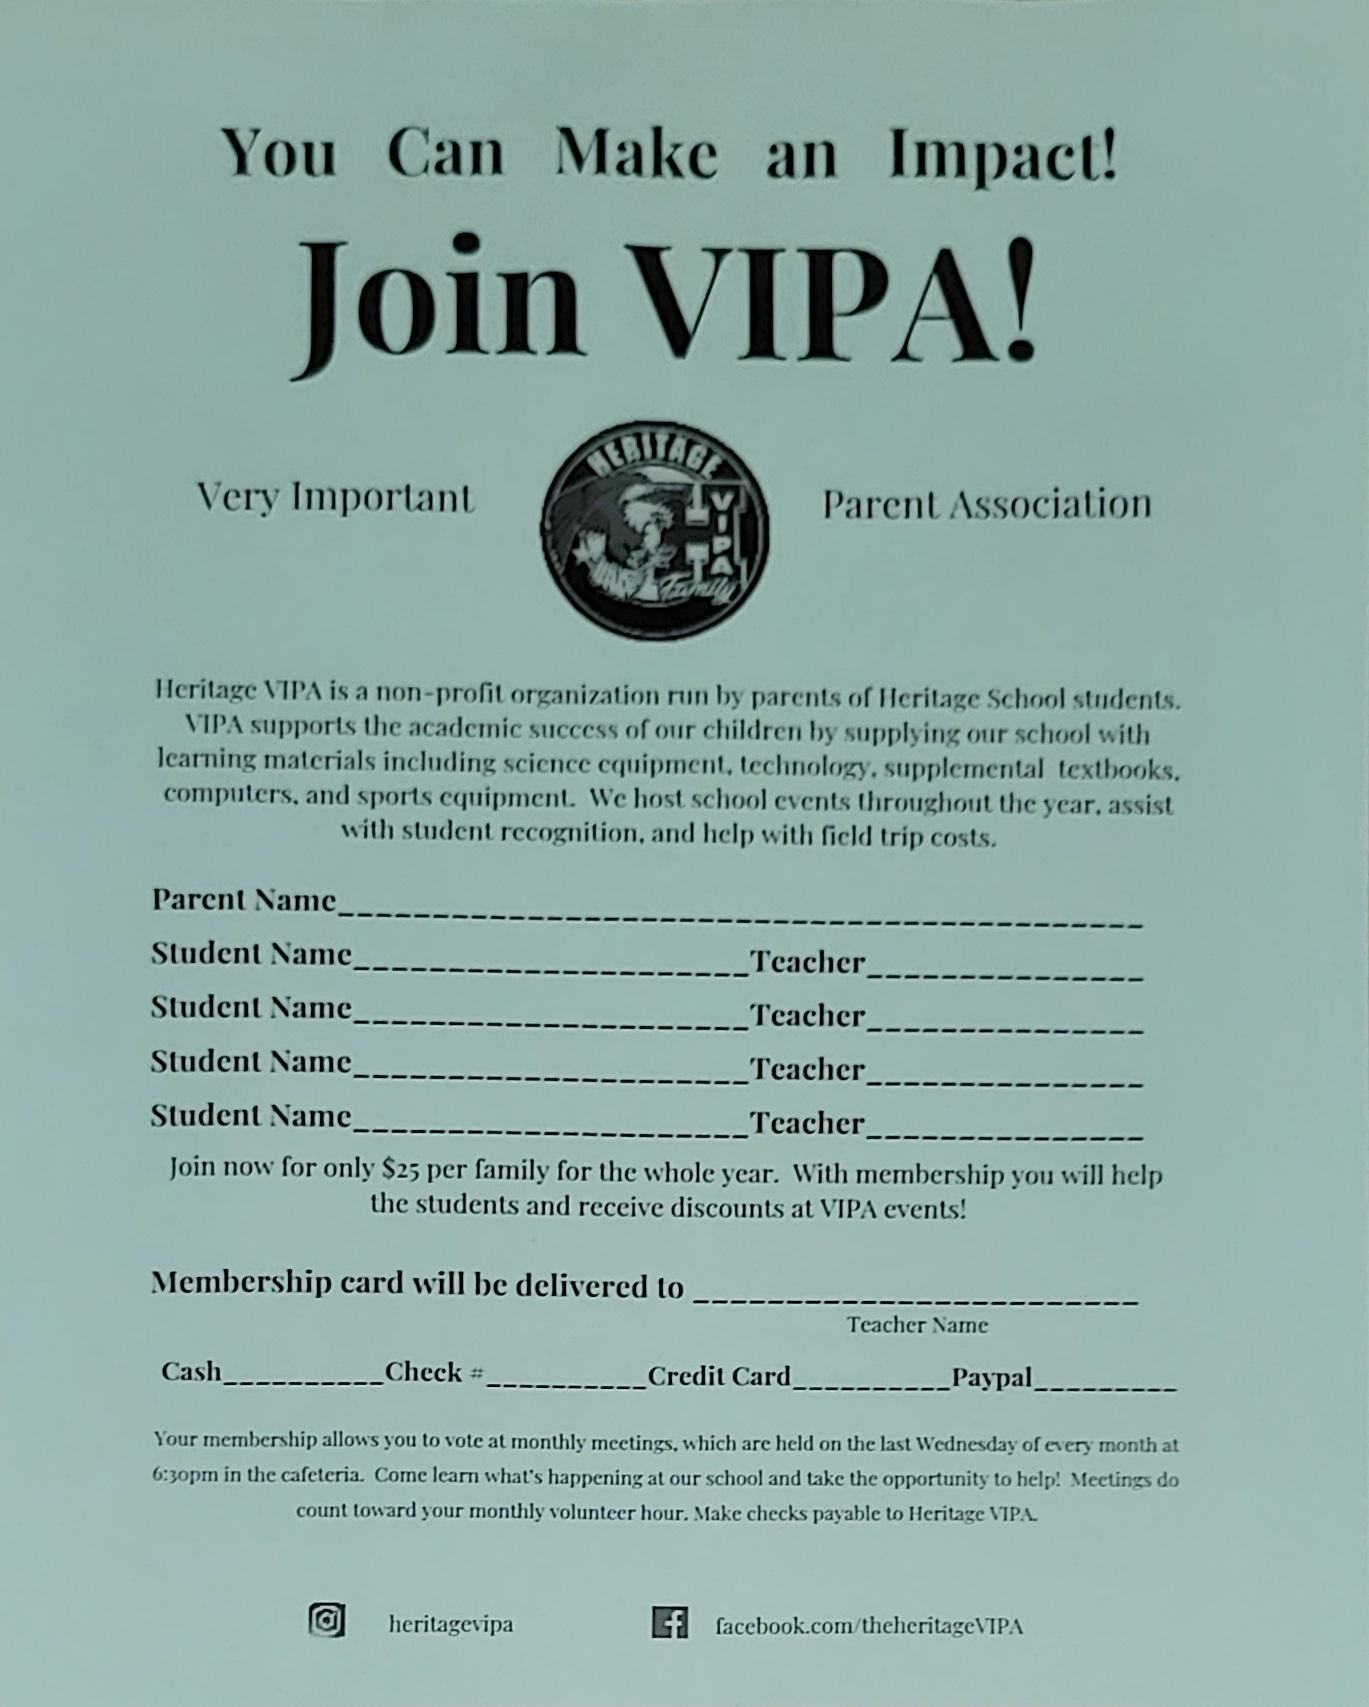 VIPA membership form